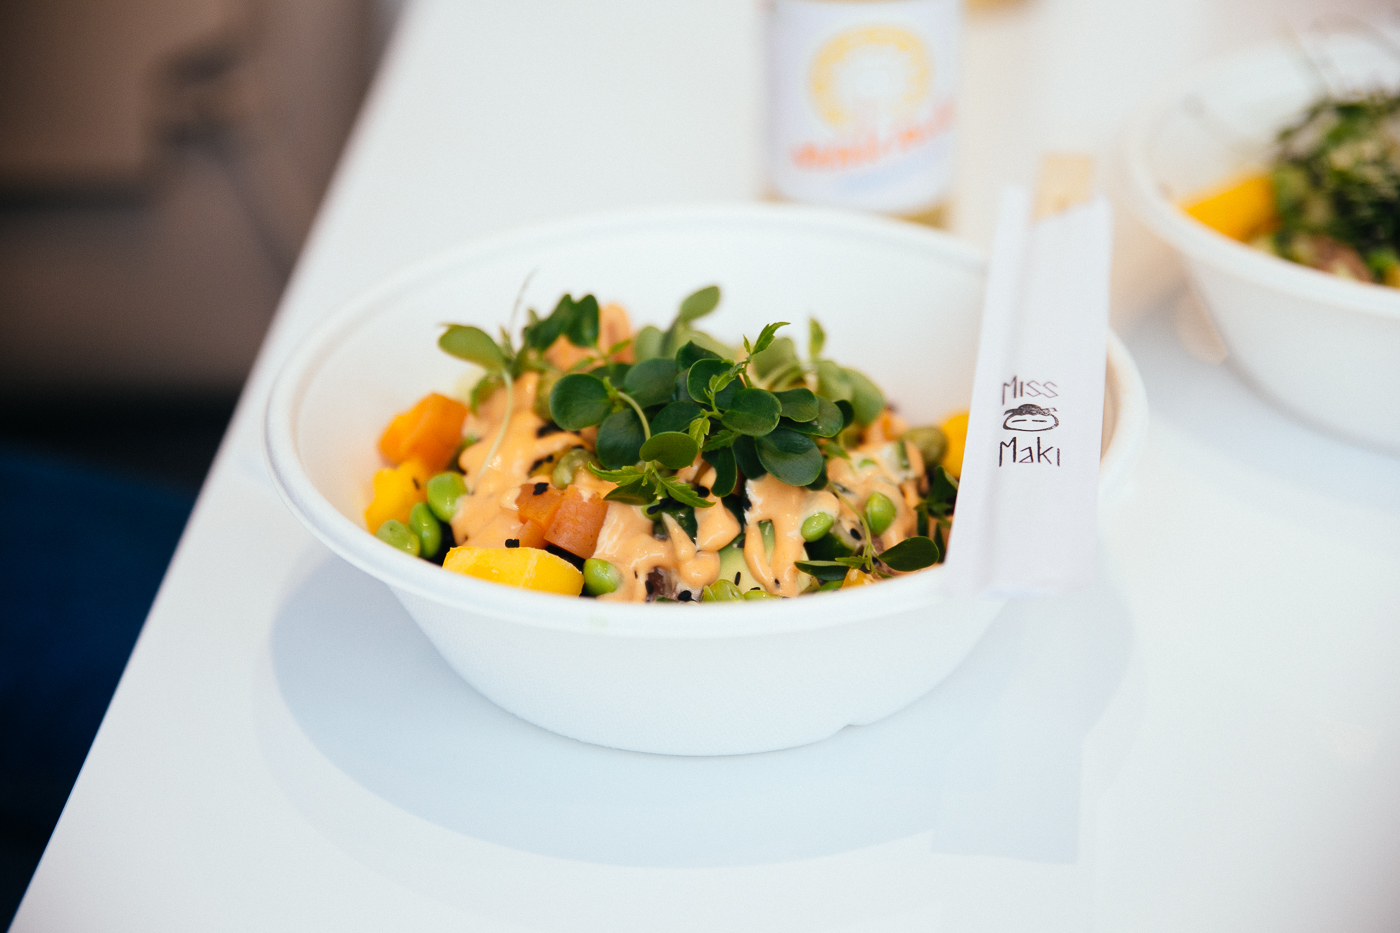 Miss Maki Wien - Sushi Bowls, Sushi Burritos | Love Daily Dose